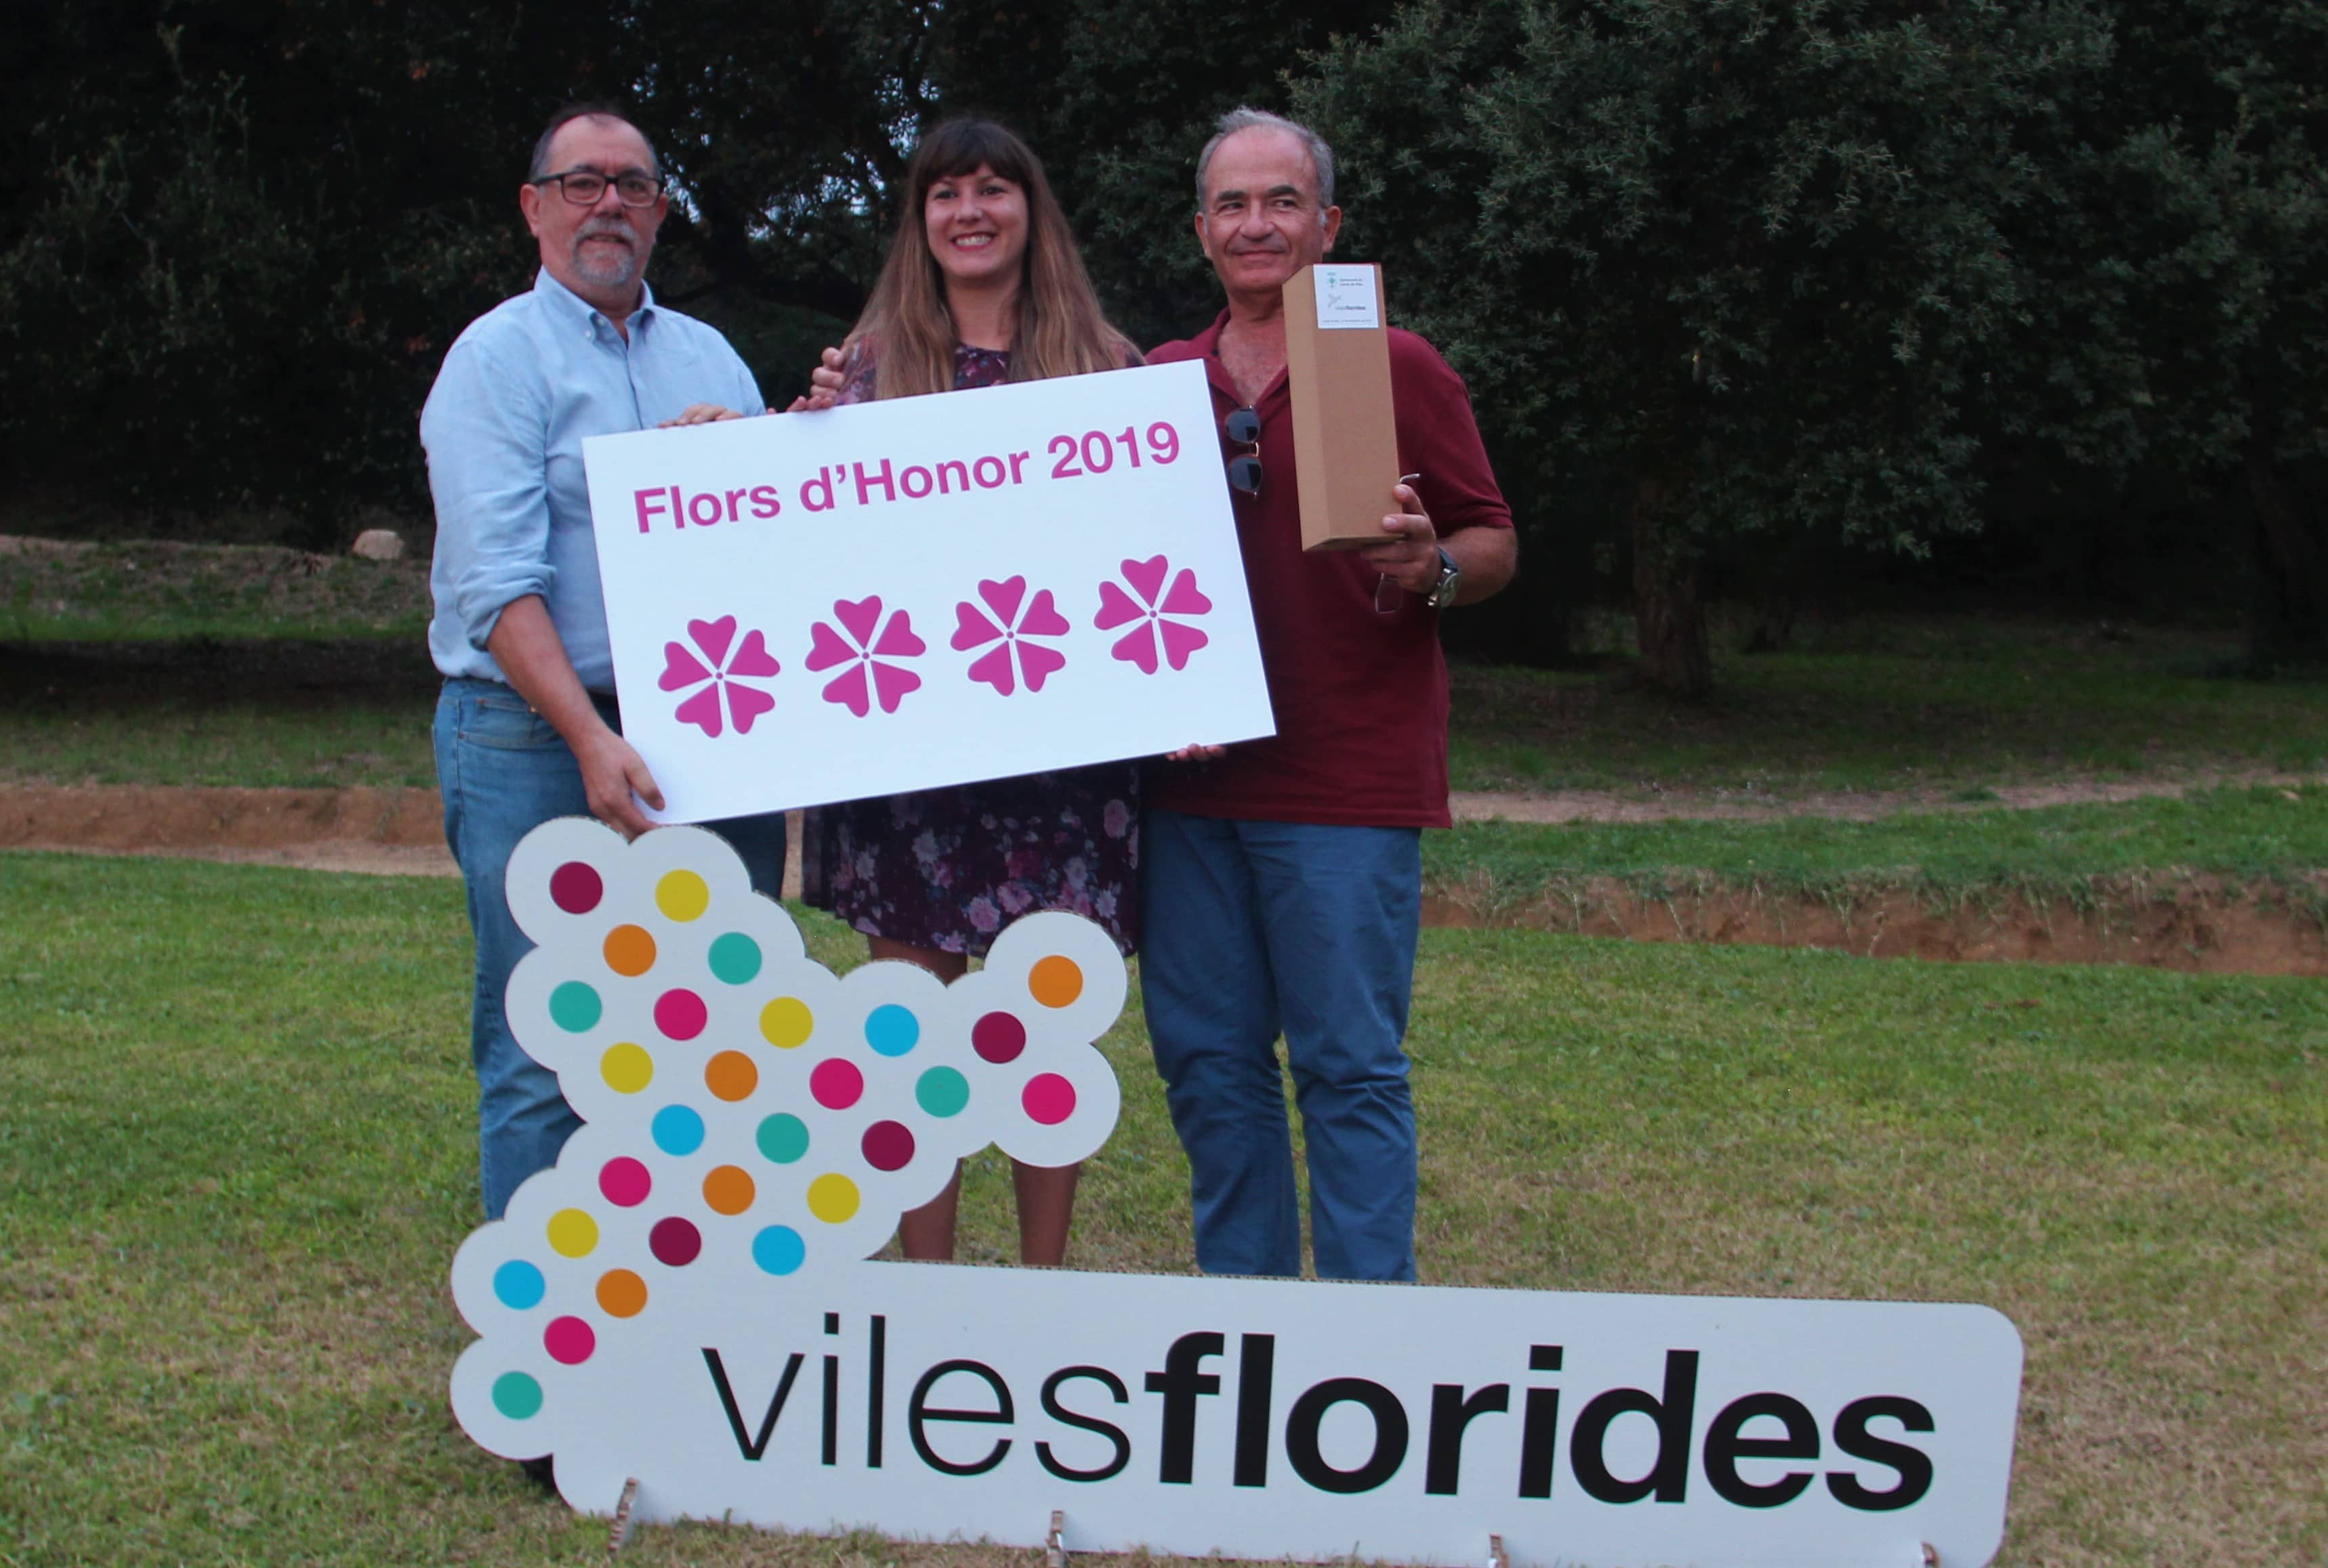 viles florides 2019, JGU (21)